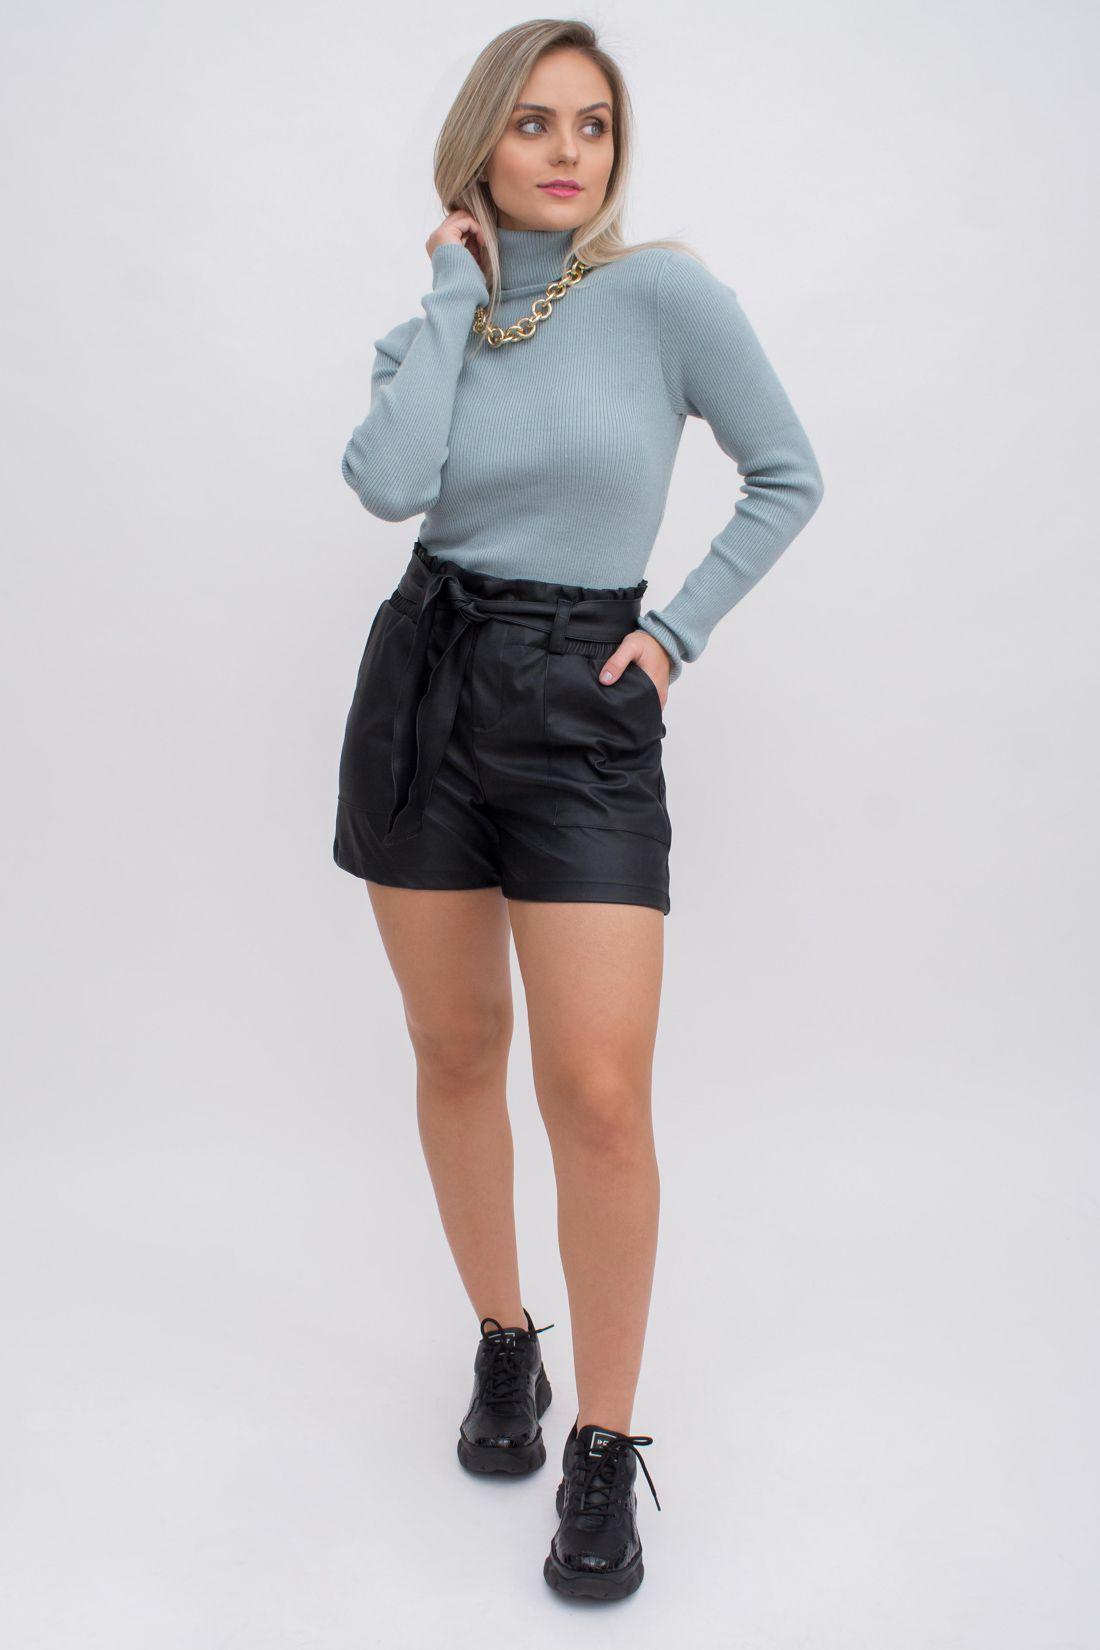 Shorts Yexx Clochard Couro